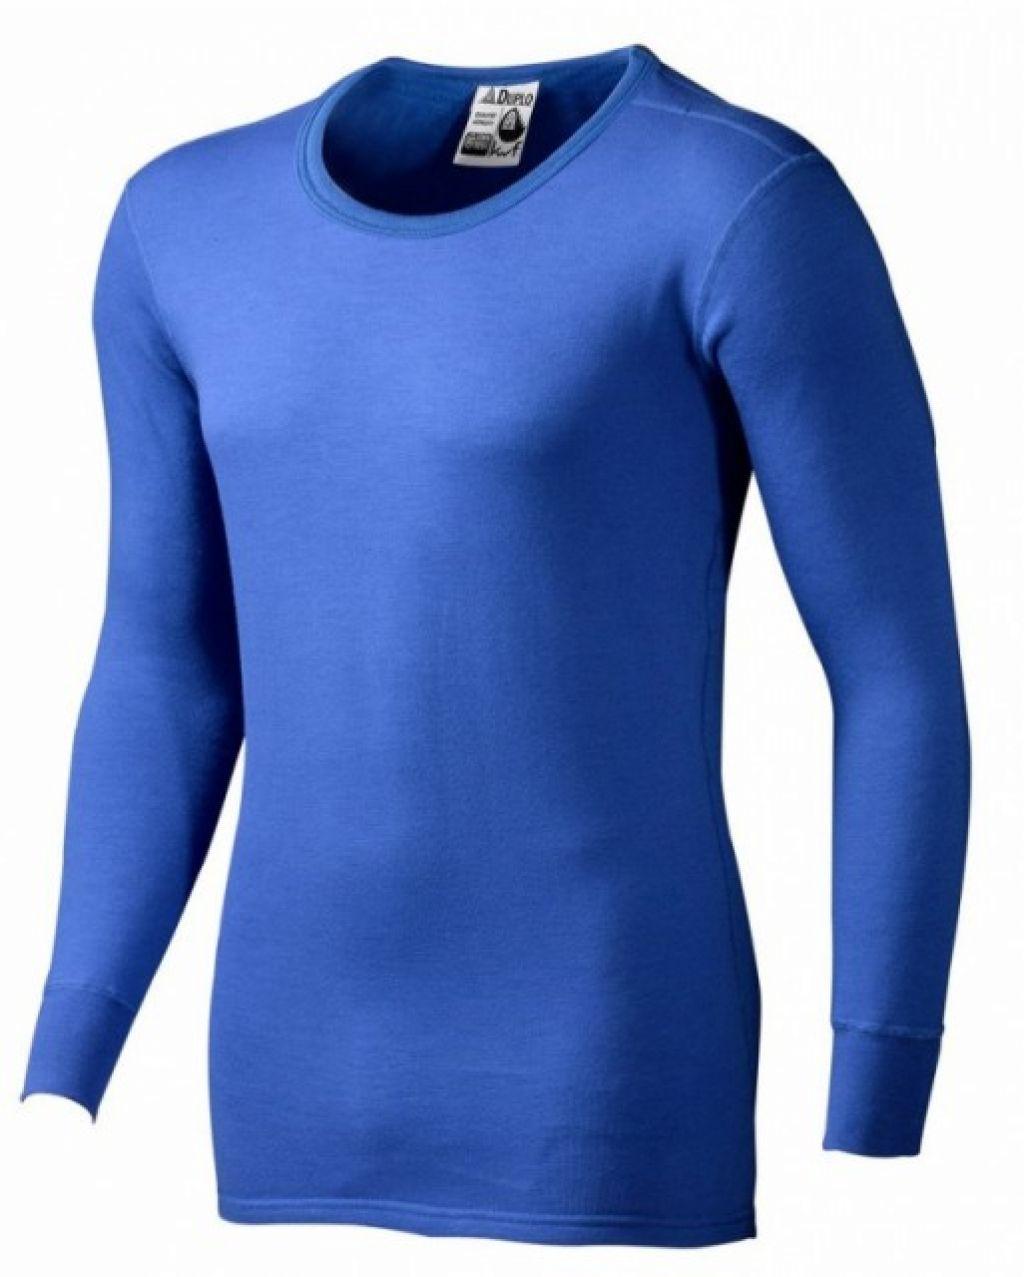 69f2f1c029d0 Funkčné tričko s dlhým rukávom Nordforest DUPLO